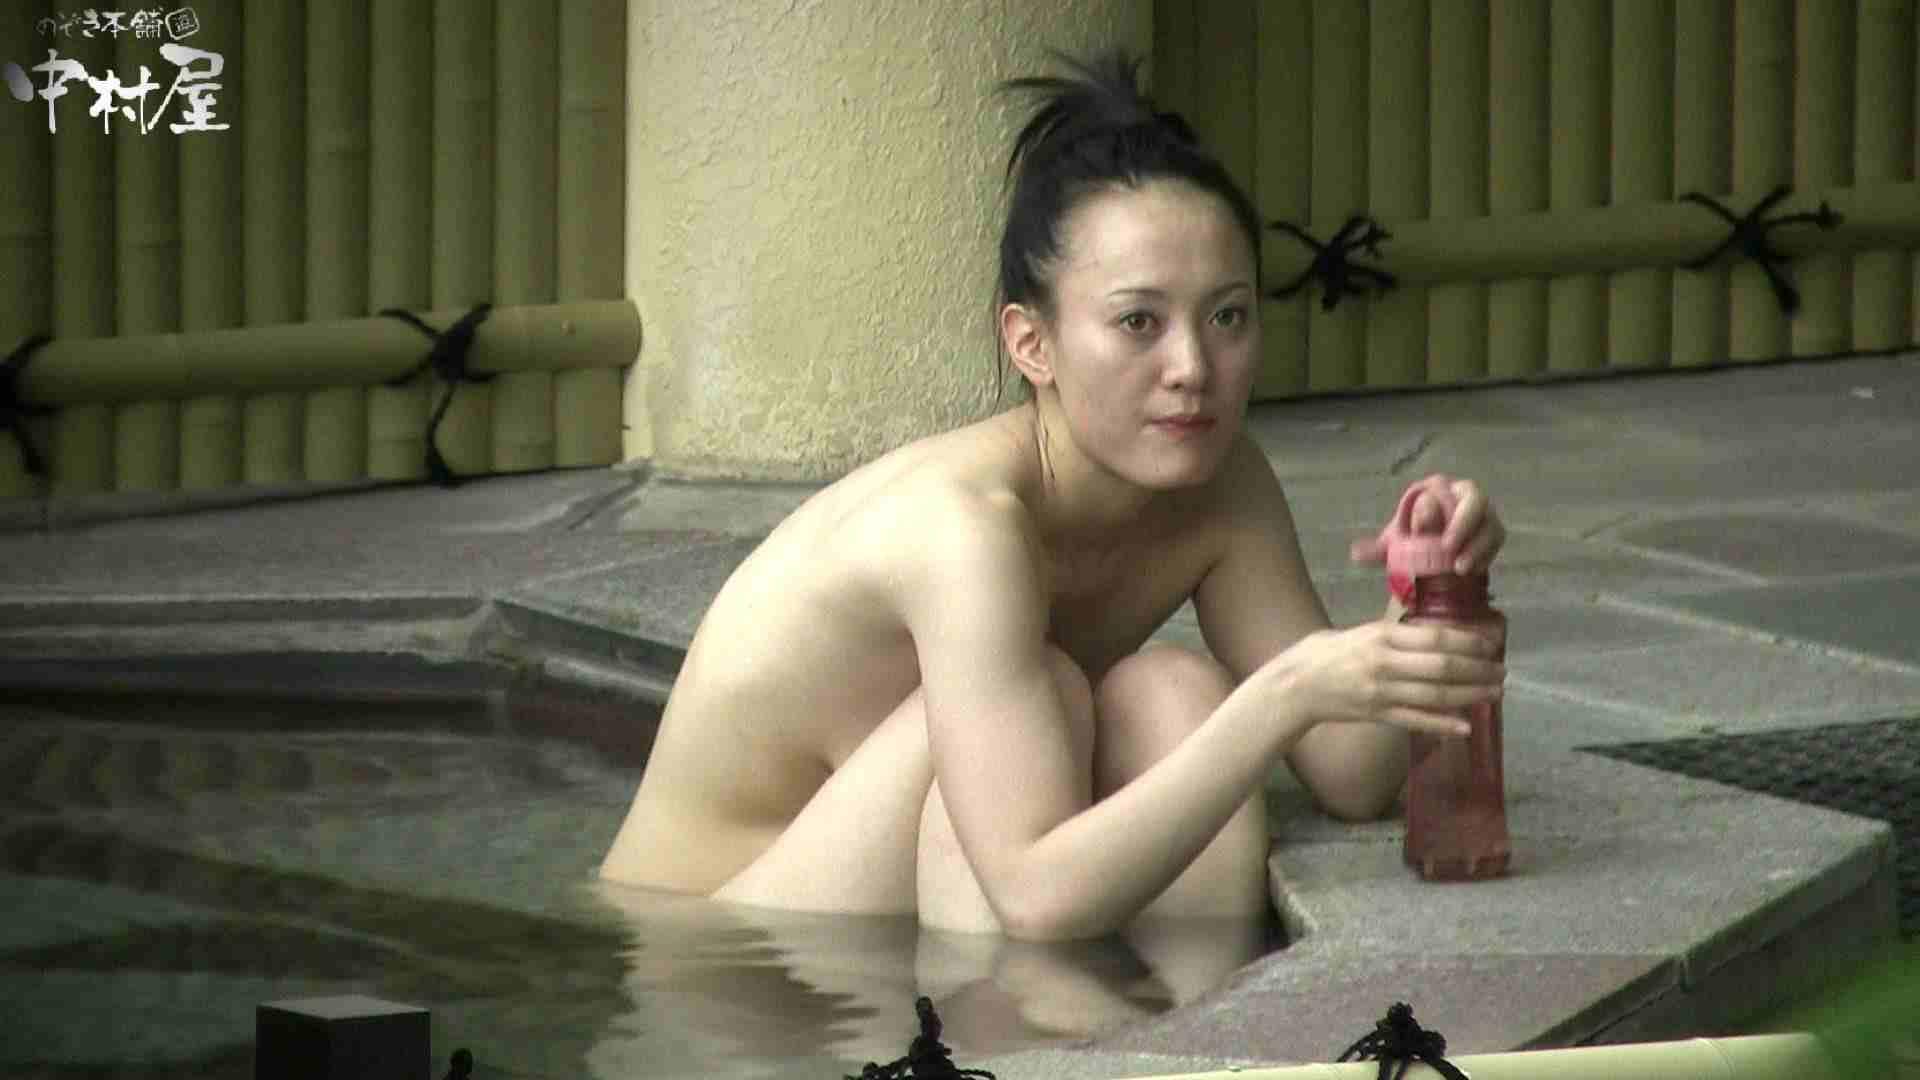 Aquaな露天風呂Vol.900 盗撮シリーズ | 露天風呂編  110PIX 79